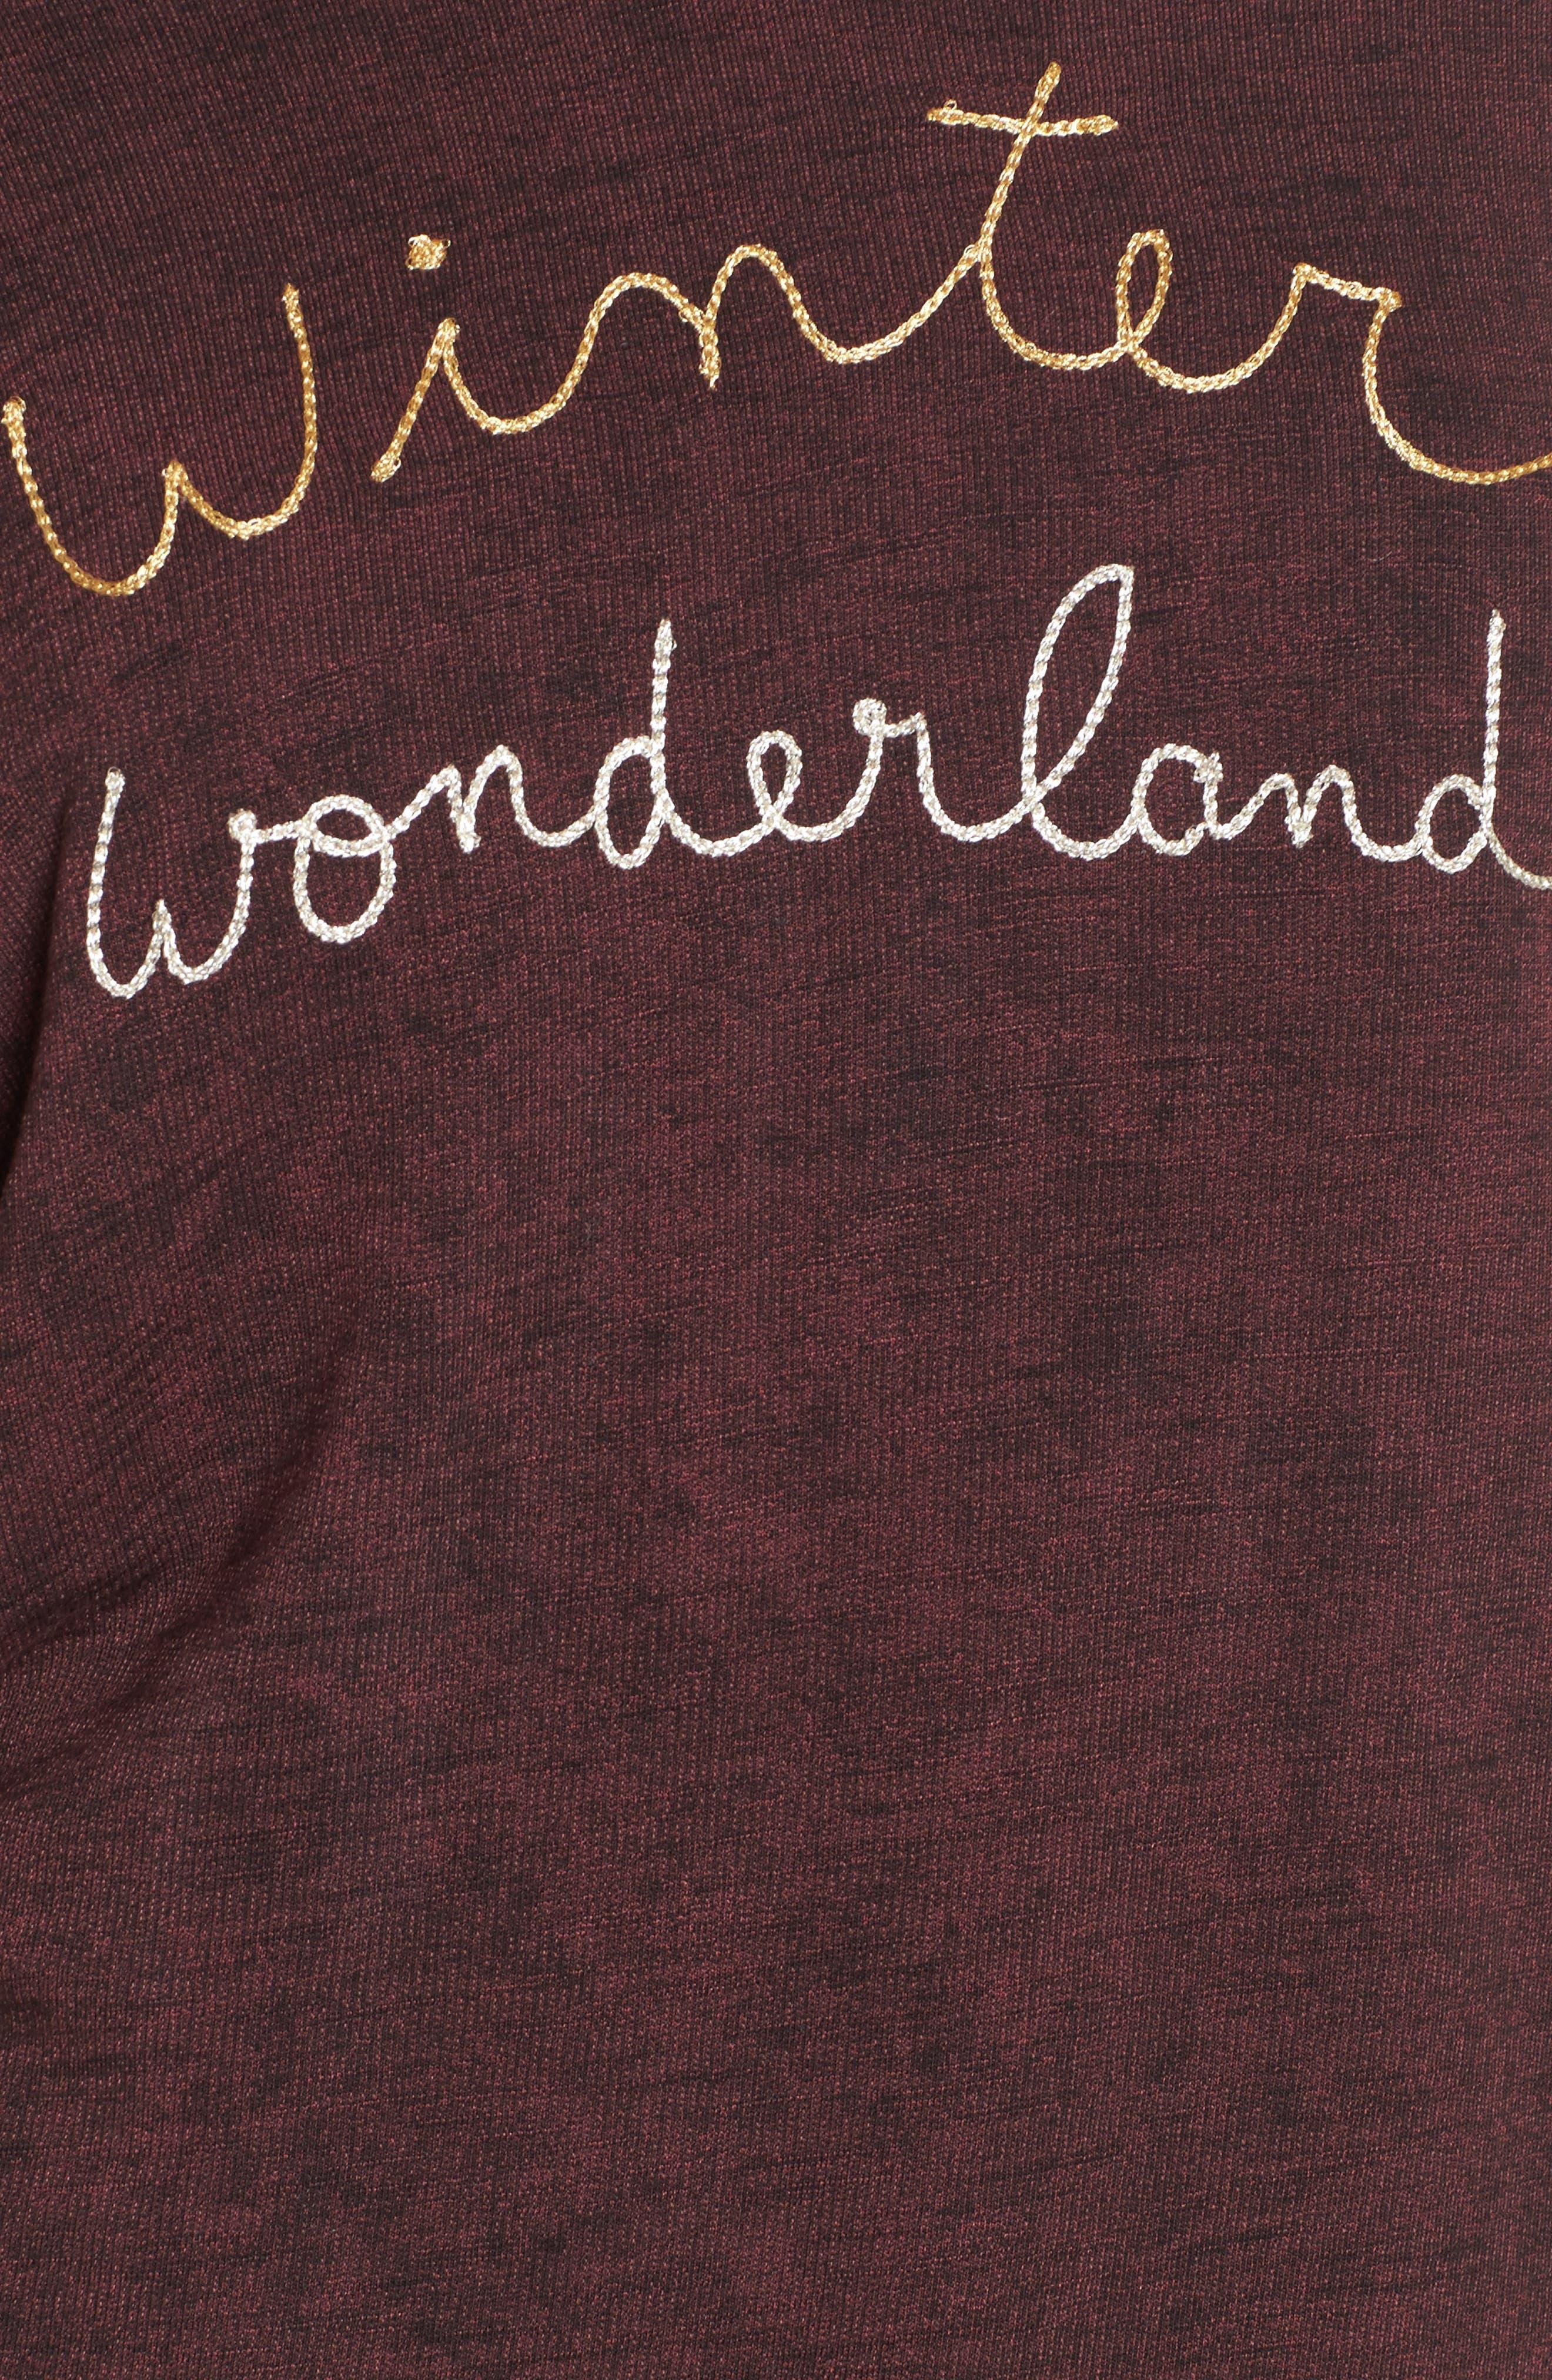 Active Winter Wonderland Sweatshirt,                             Alternate thumbnail 5, color,                             Burgundy Acid Wash